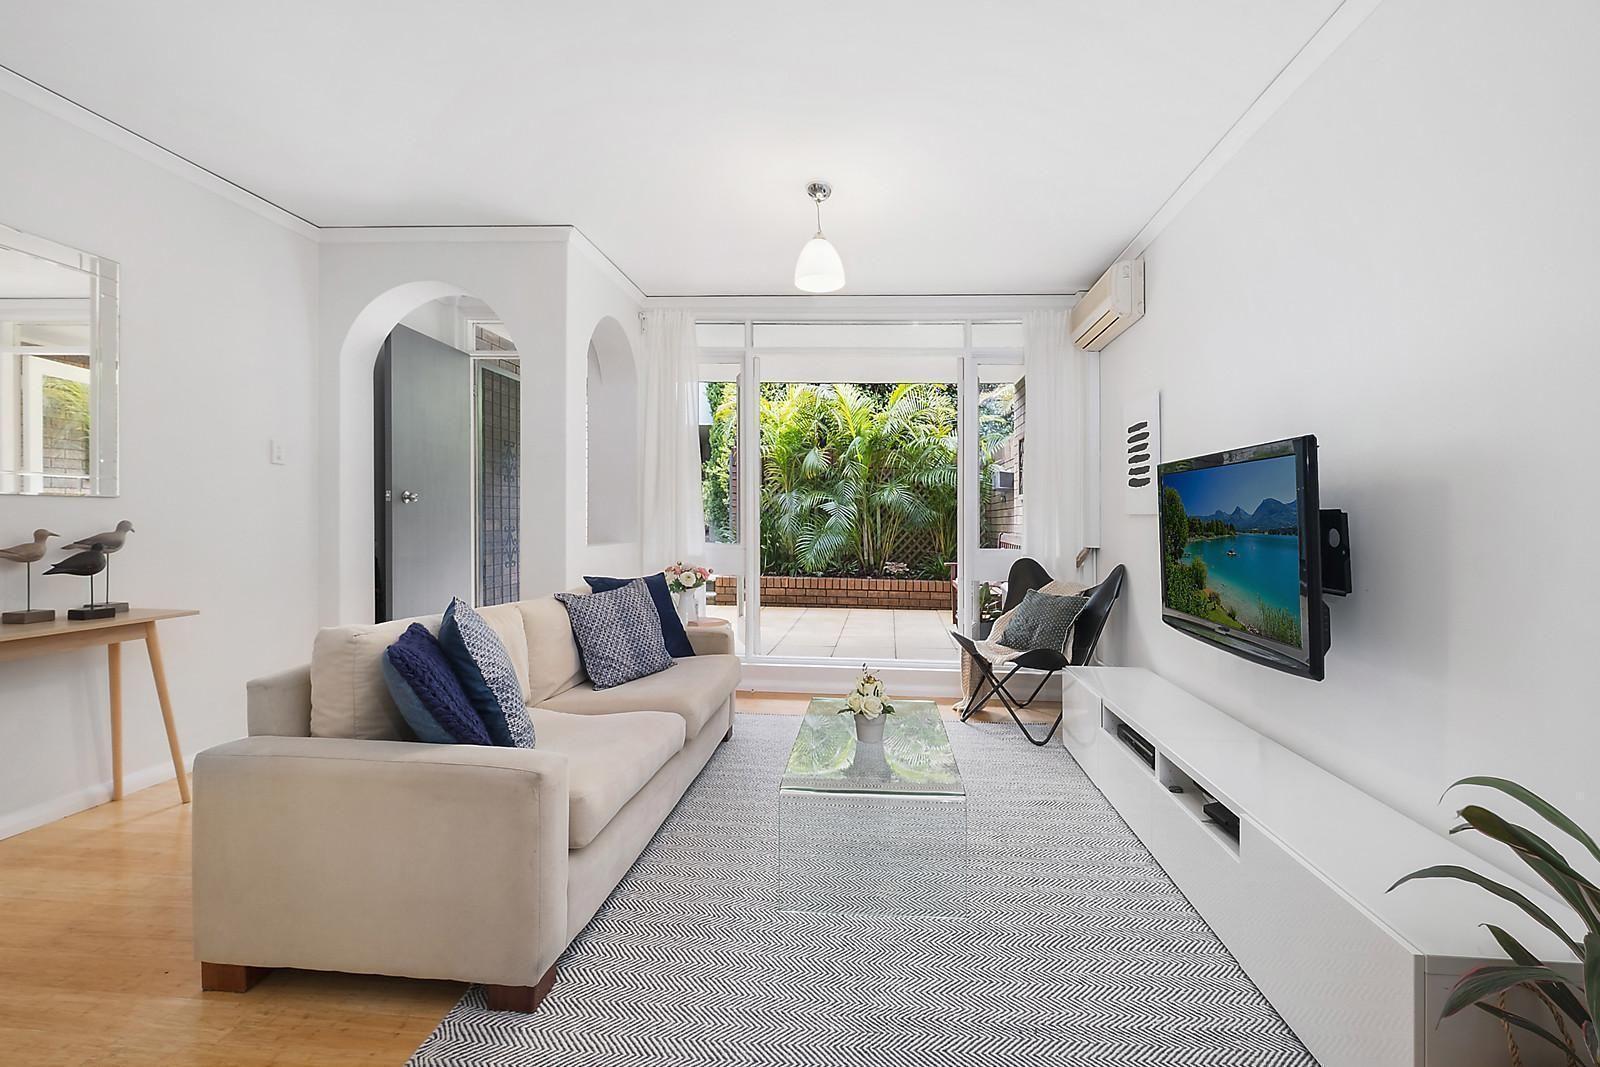 13/2 Trafalgar Street, Crows Nest NSW 2065, Image 0